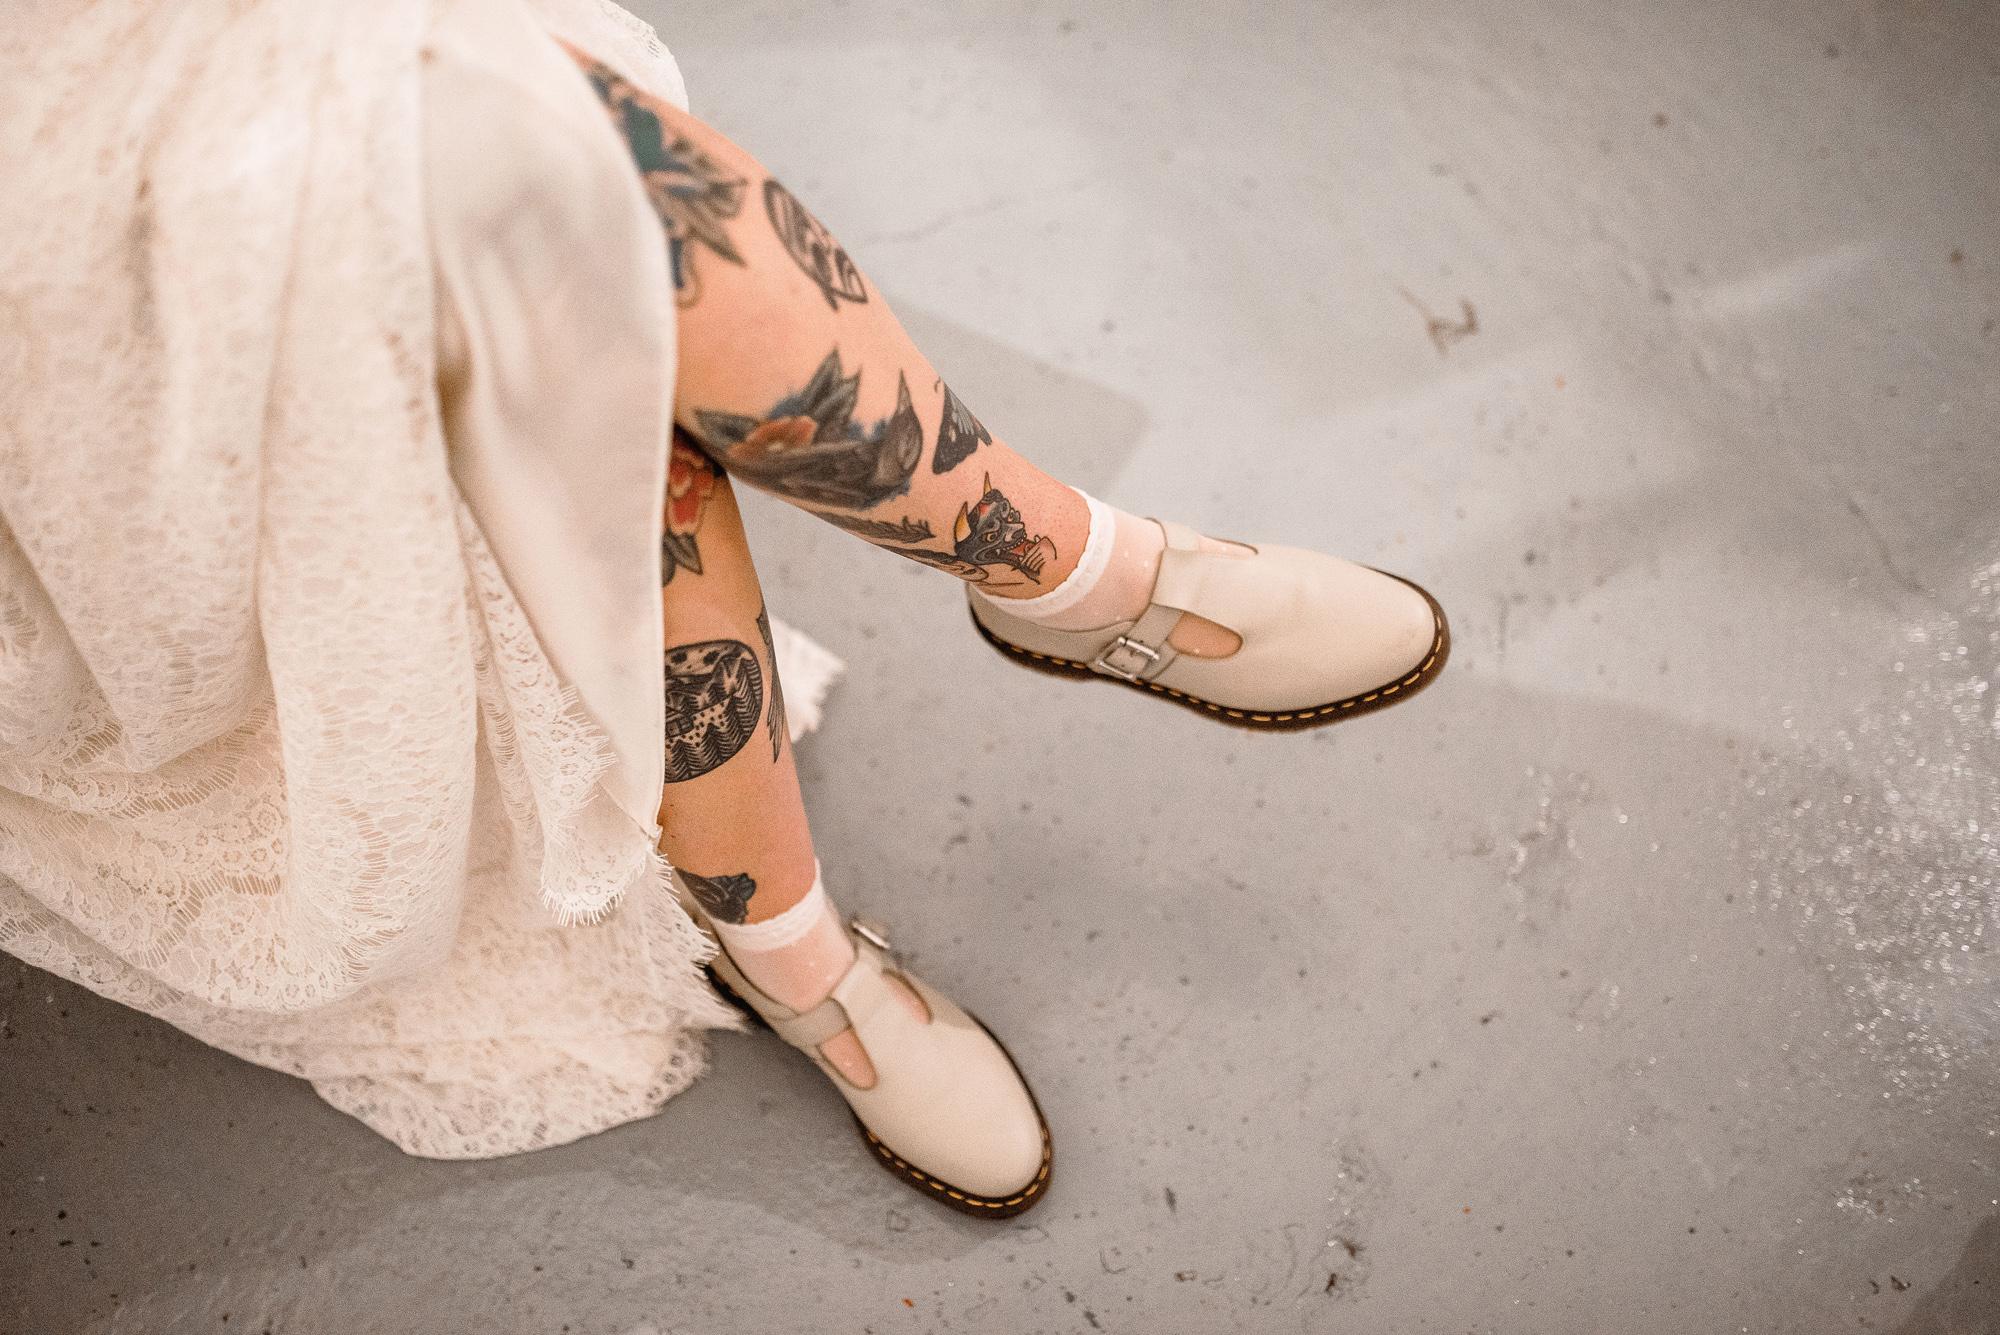 Harriet-Dahlia-Bespoke-Lace-Silk-Bohemian-Wedding-Dress-Sleeves-Tattooed-Bride-Alternative-Wedding-Sheffield-47.jpg